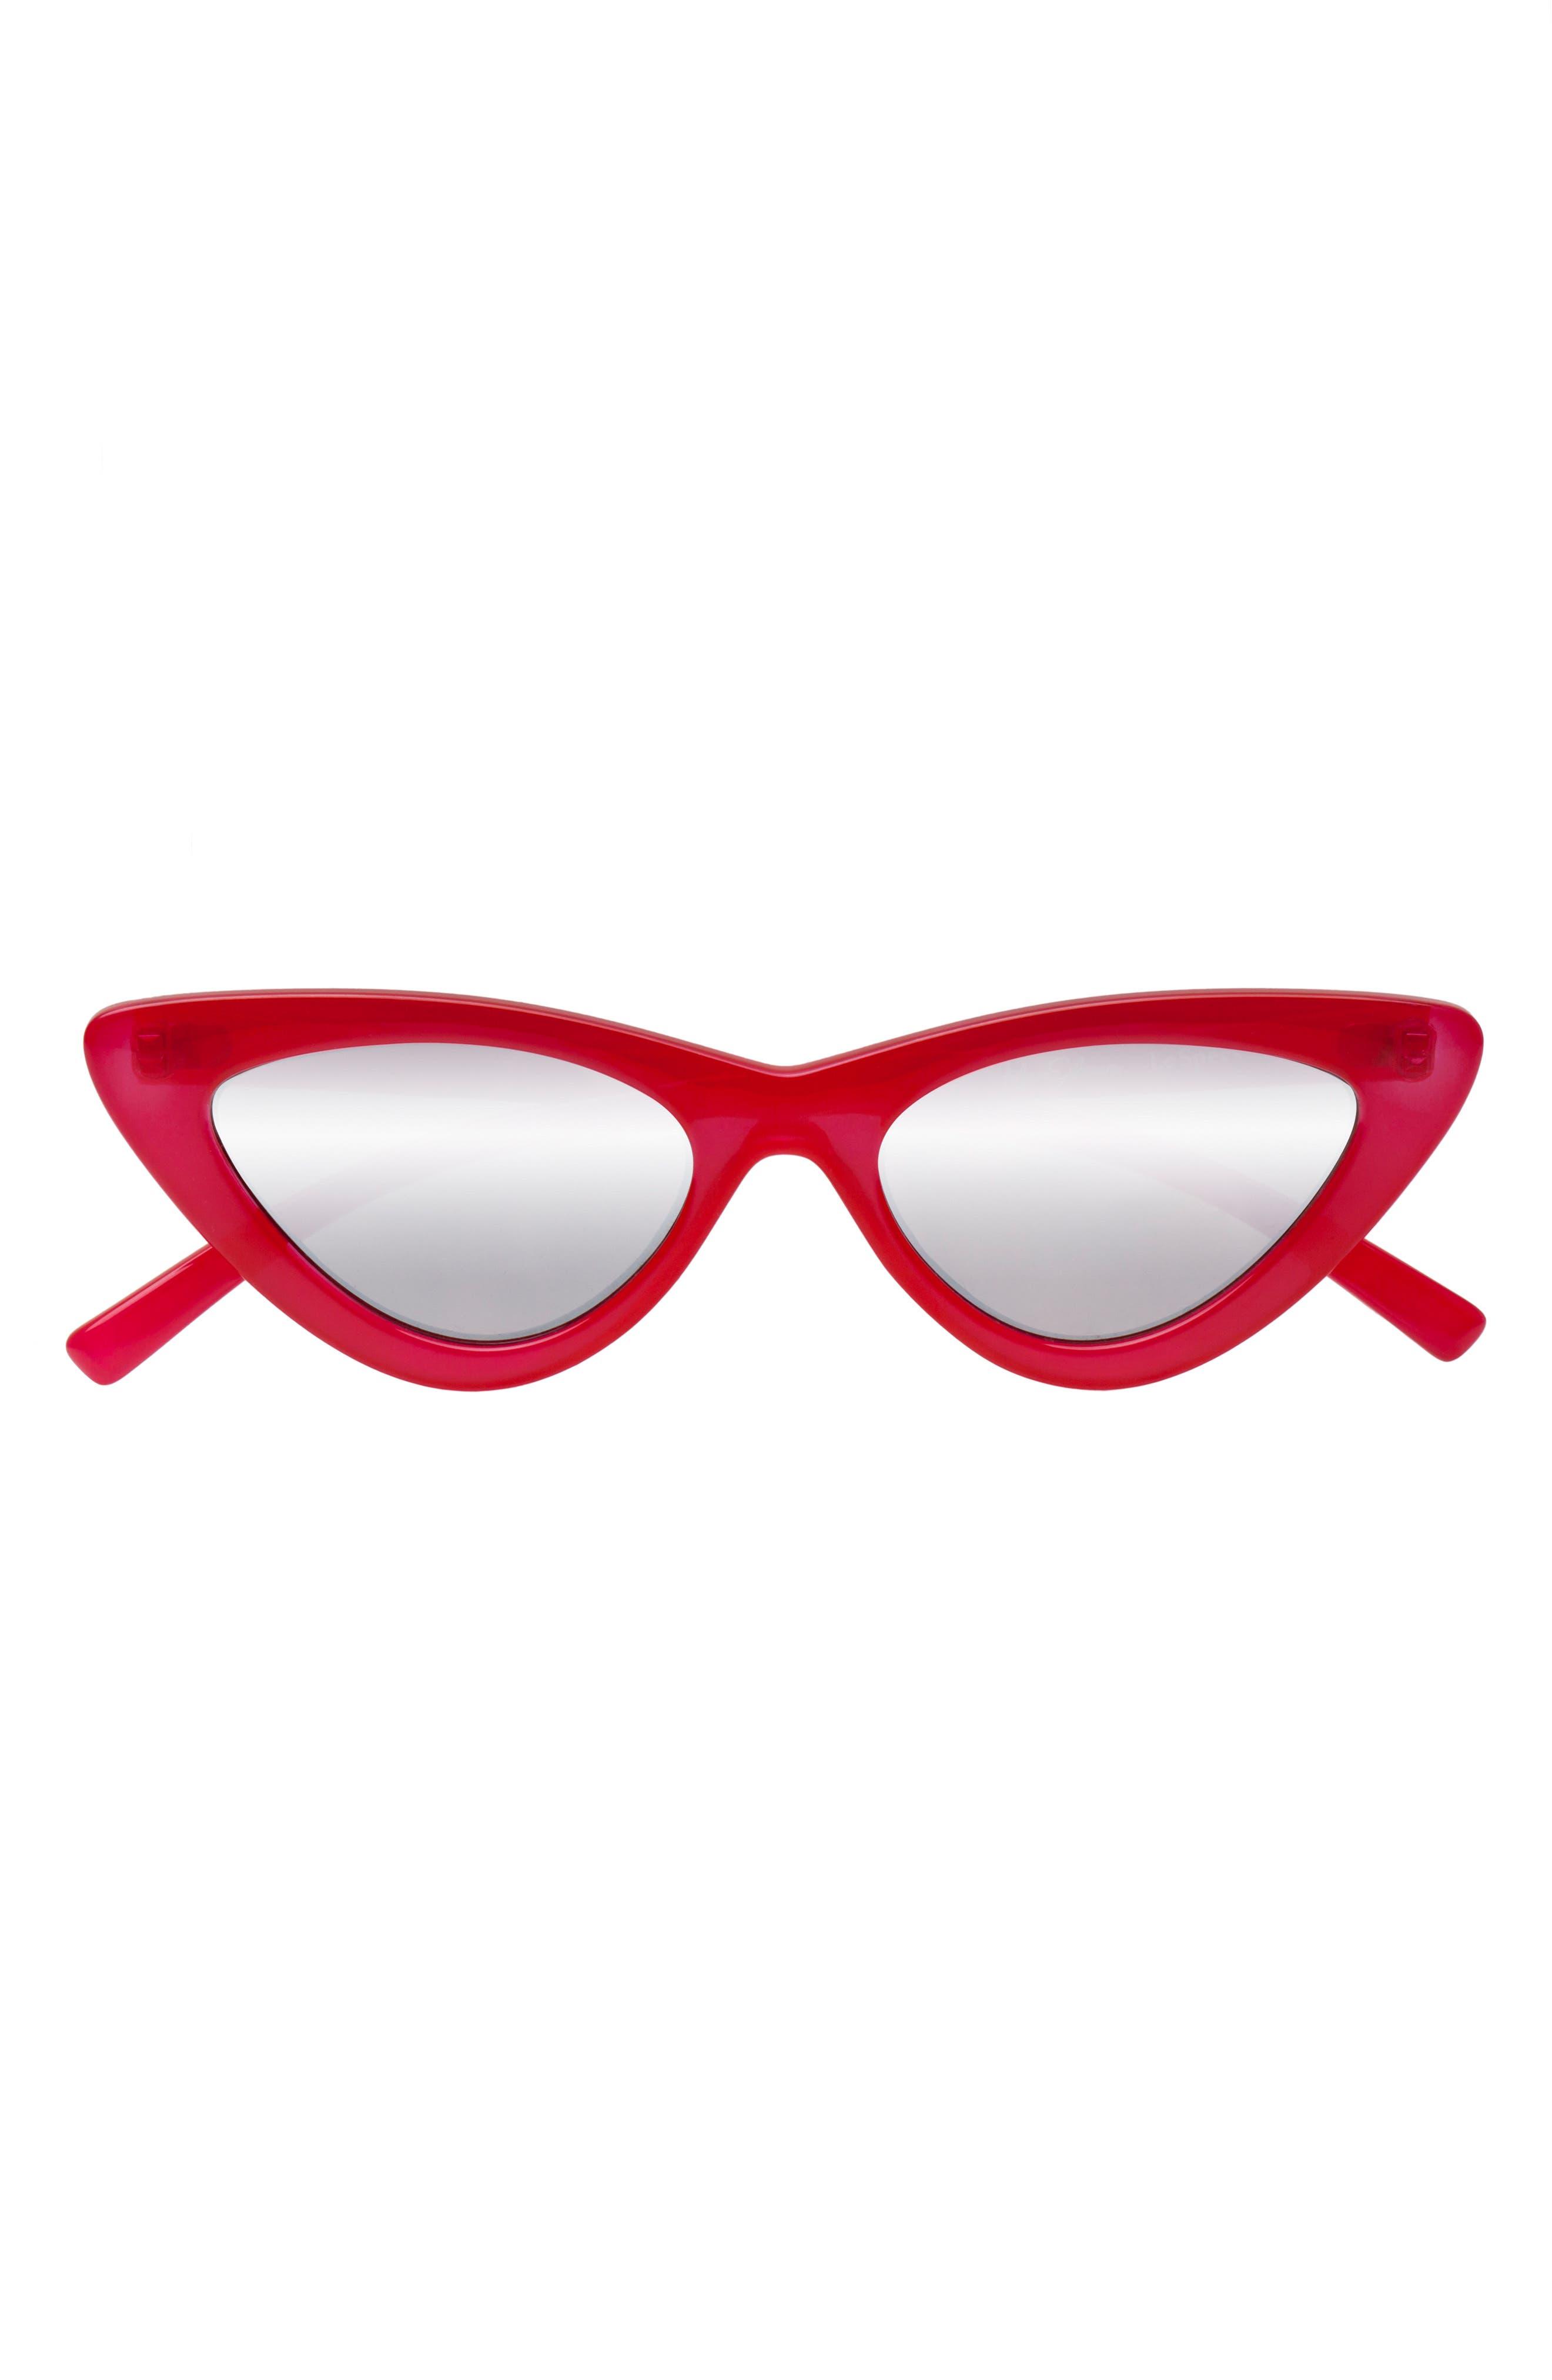 Alternate Image 1 Selected - Adam Selman x Le Specs Luxe Last Lolita 49mm Cat Eye Sunglasses